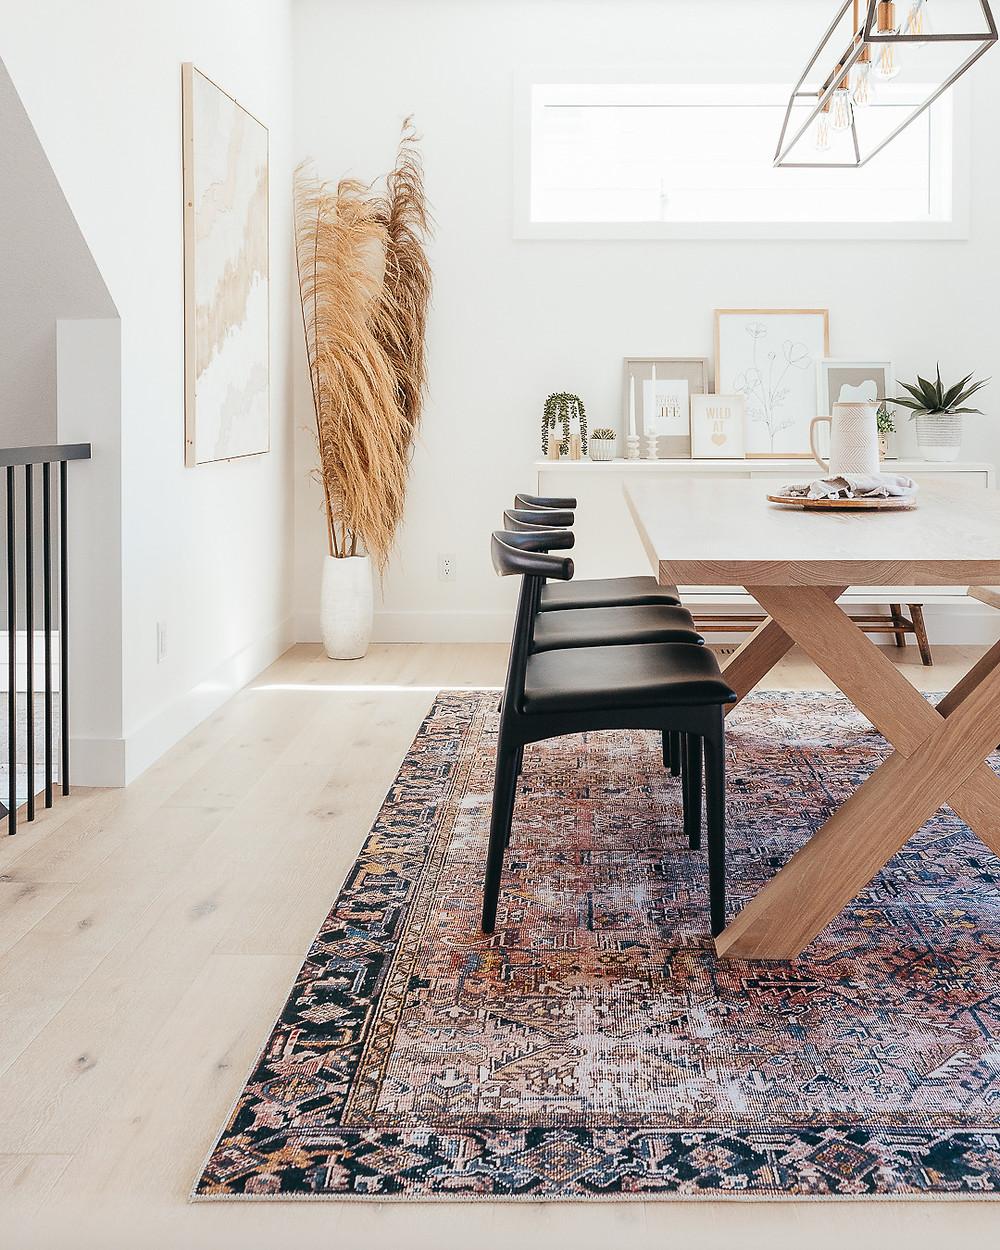 White oak hardwood floors midcentury Scandinavian style home design modern minimal boho style